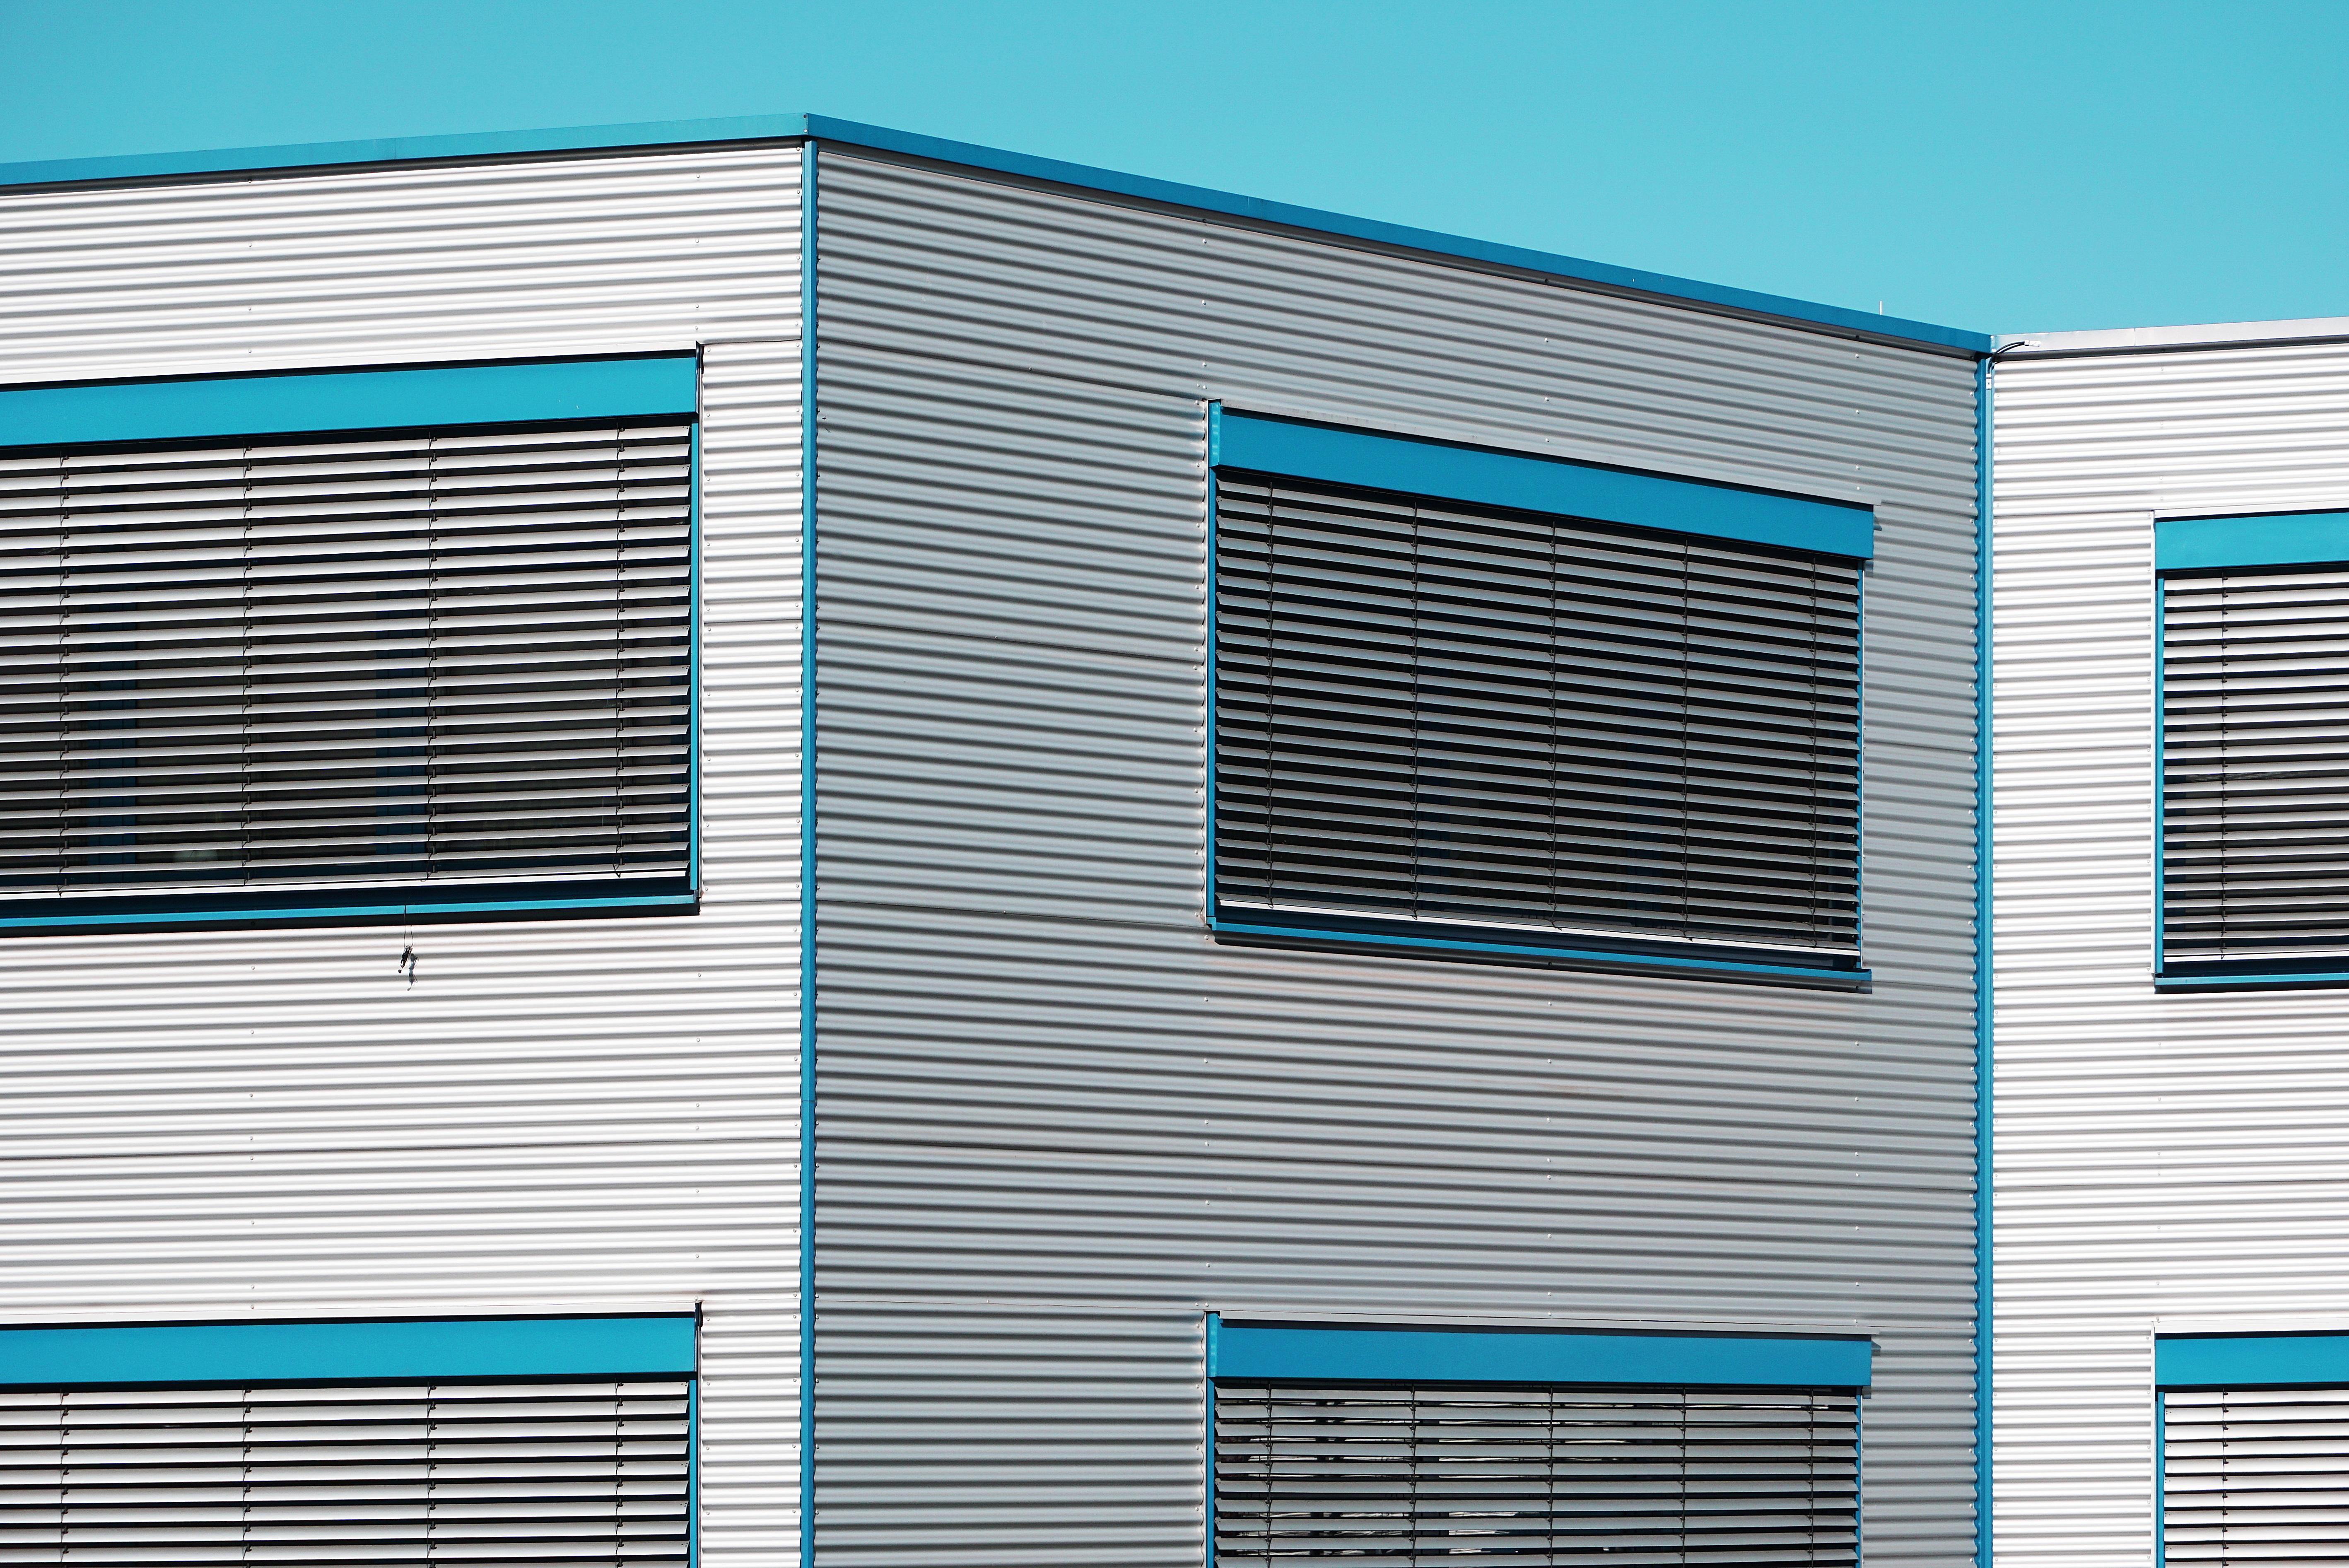 madera edificio pared lnea fachada azul material alto diseo de interiores diseo ventanas va muerta